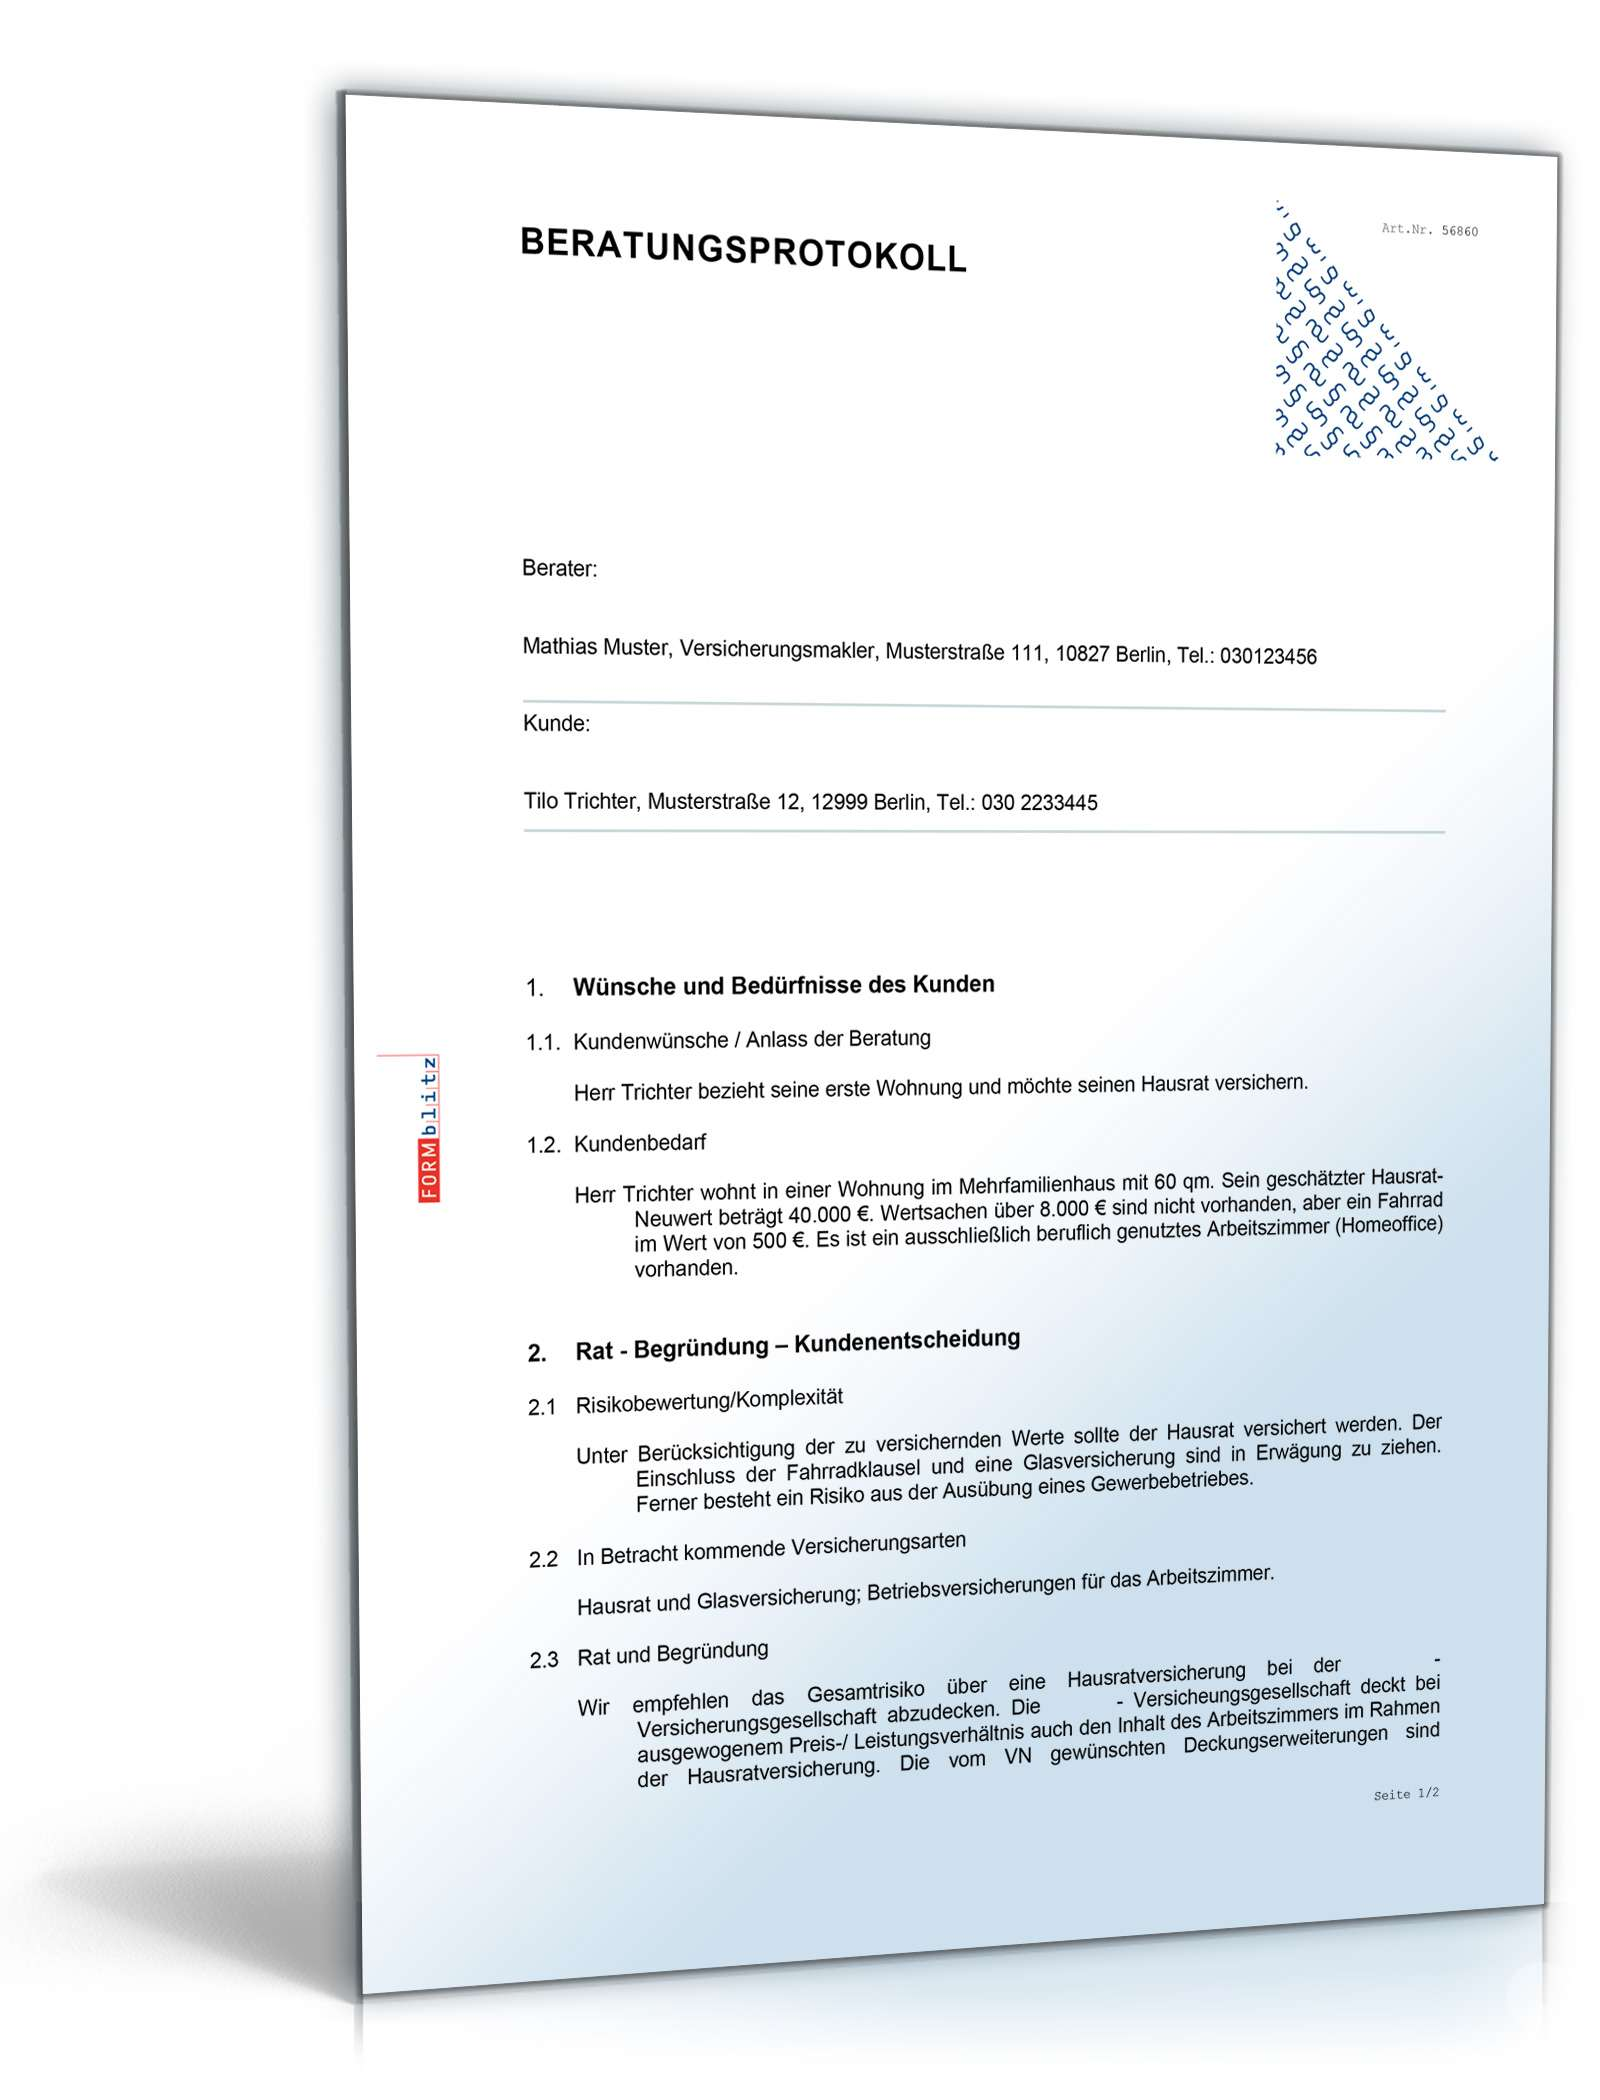 Beratungsprotokoll Versicherungsvermittlung   Muster zum Download